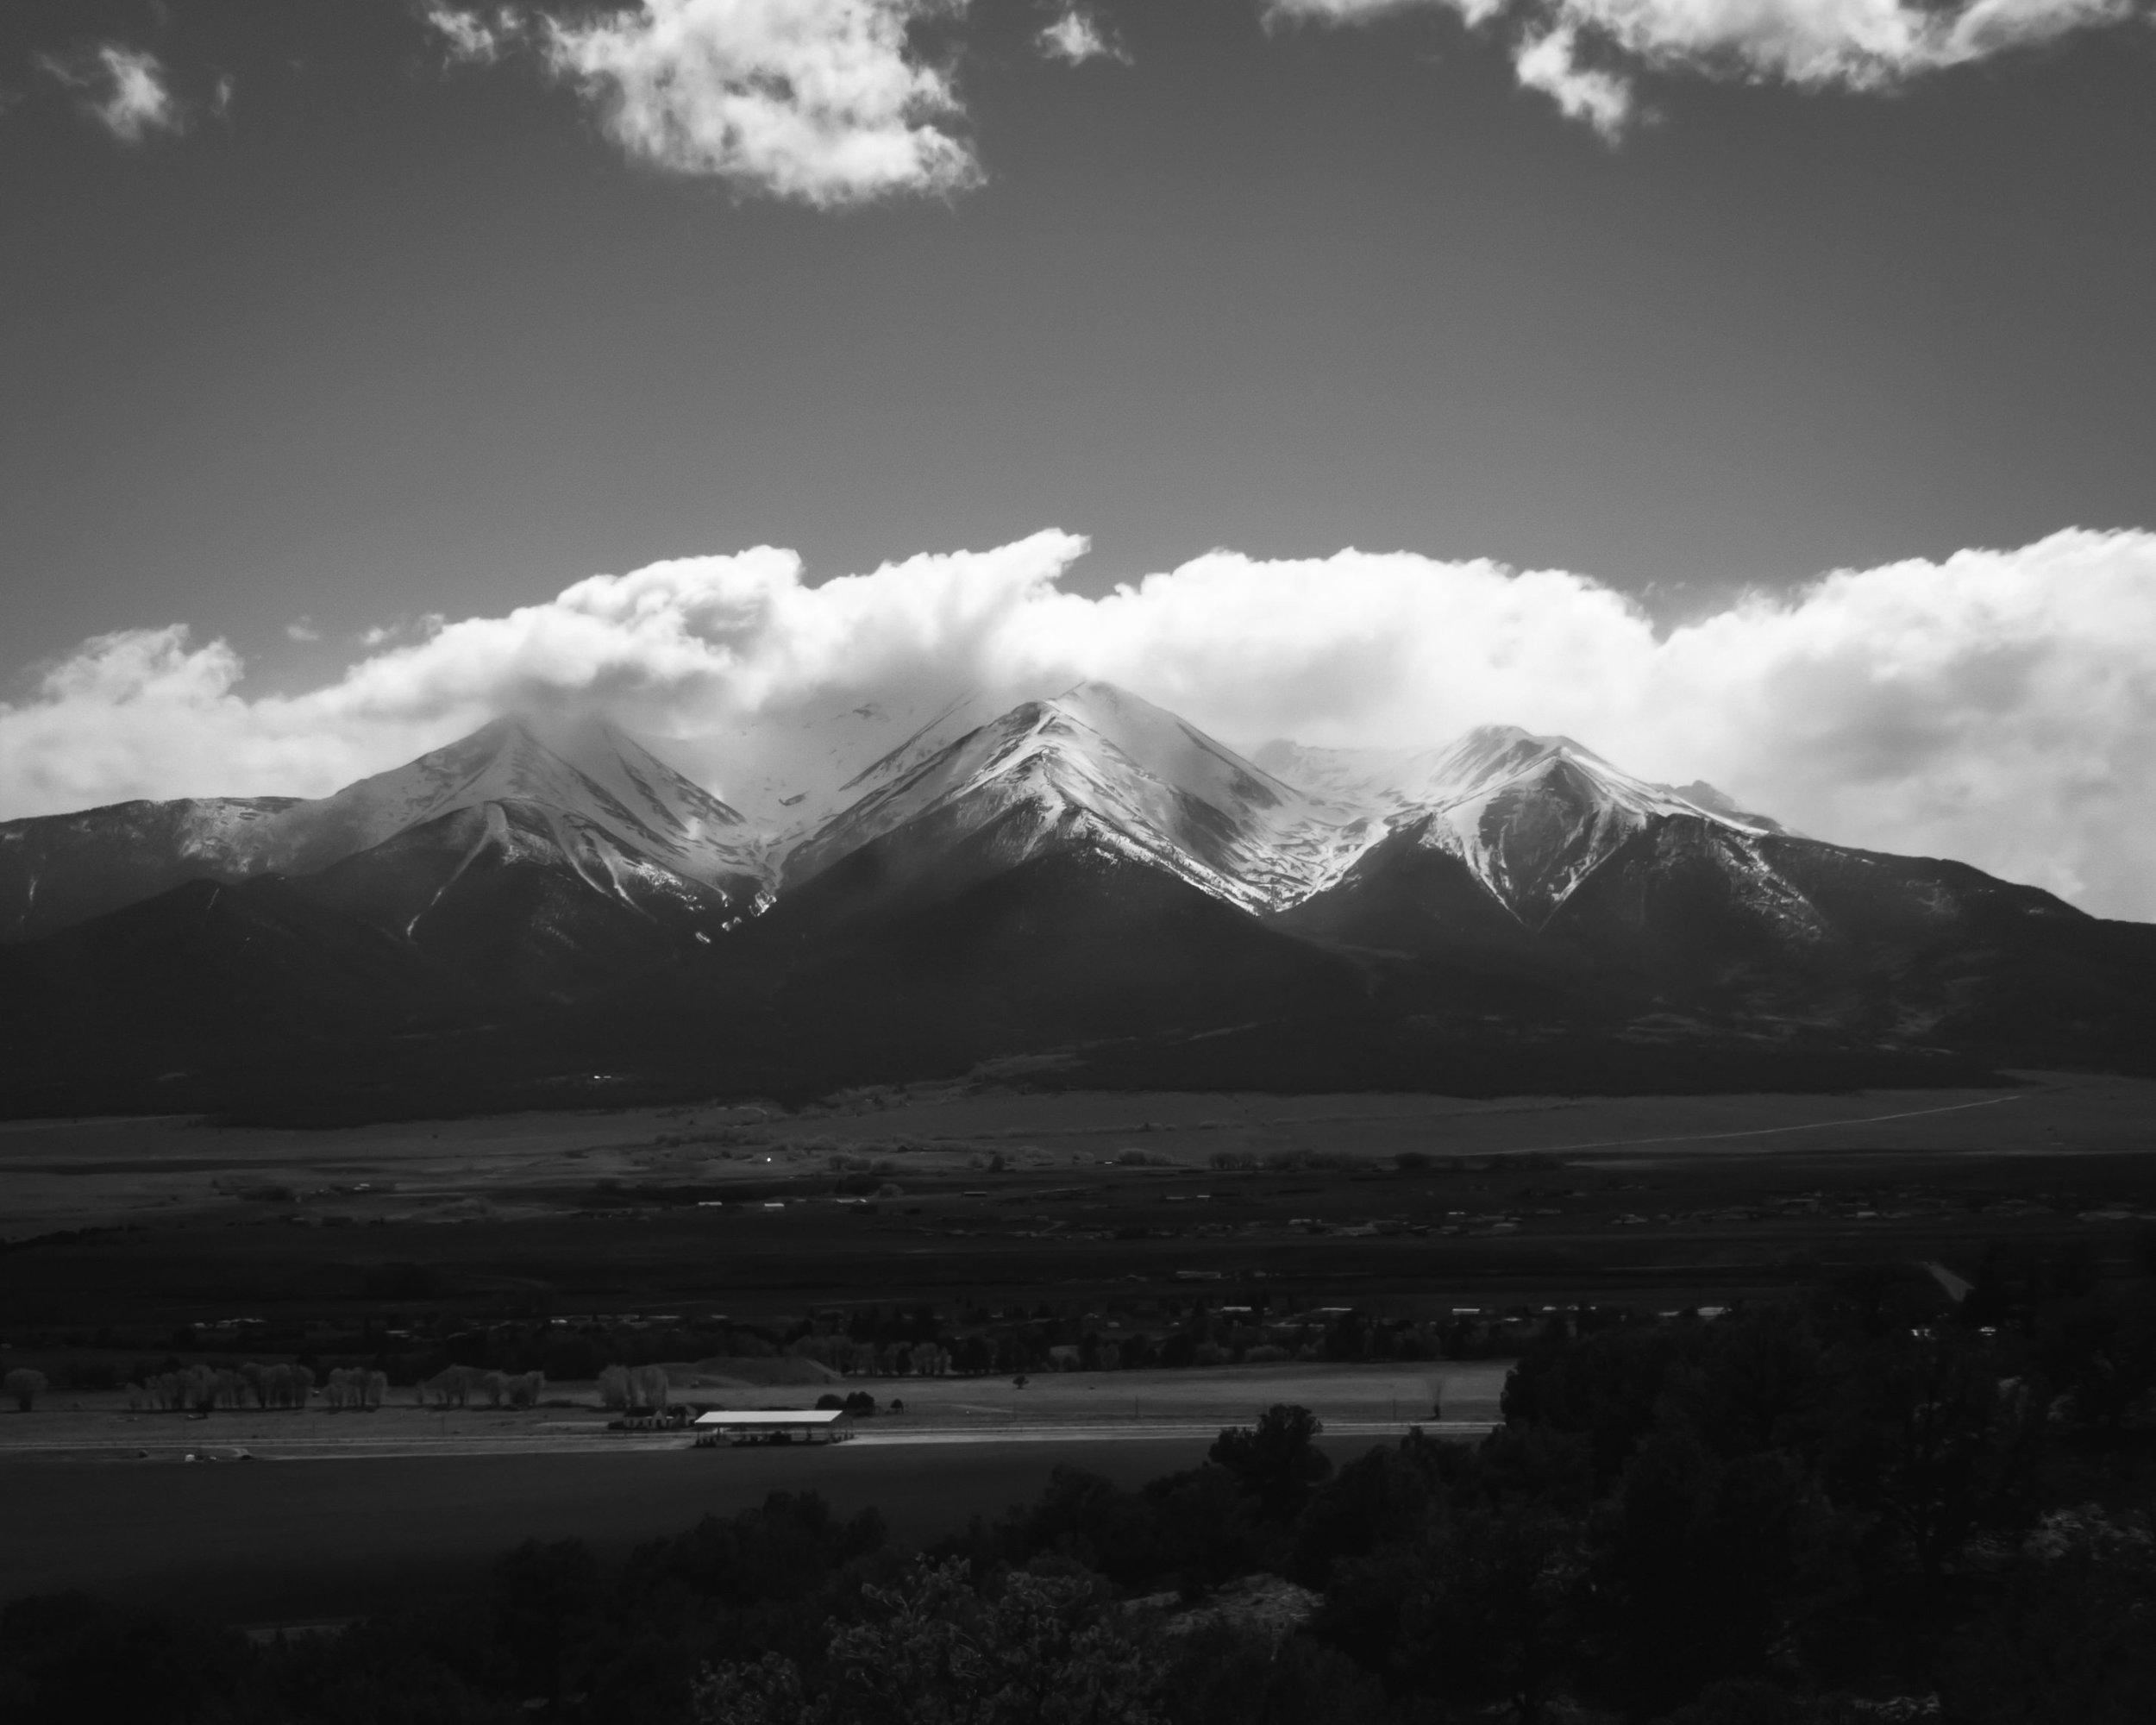 Day 139- 365 Day B&W Photo Challenge - Views of Mt. Princeton, one of Colorado's 14K Ft. mountains. - Google Pixel 3, Moment Tele Lens, VSCO Tri-X400 Film Simulation